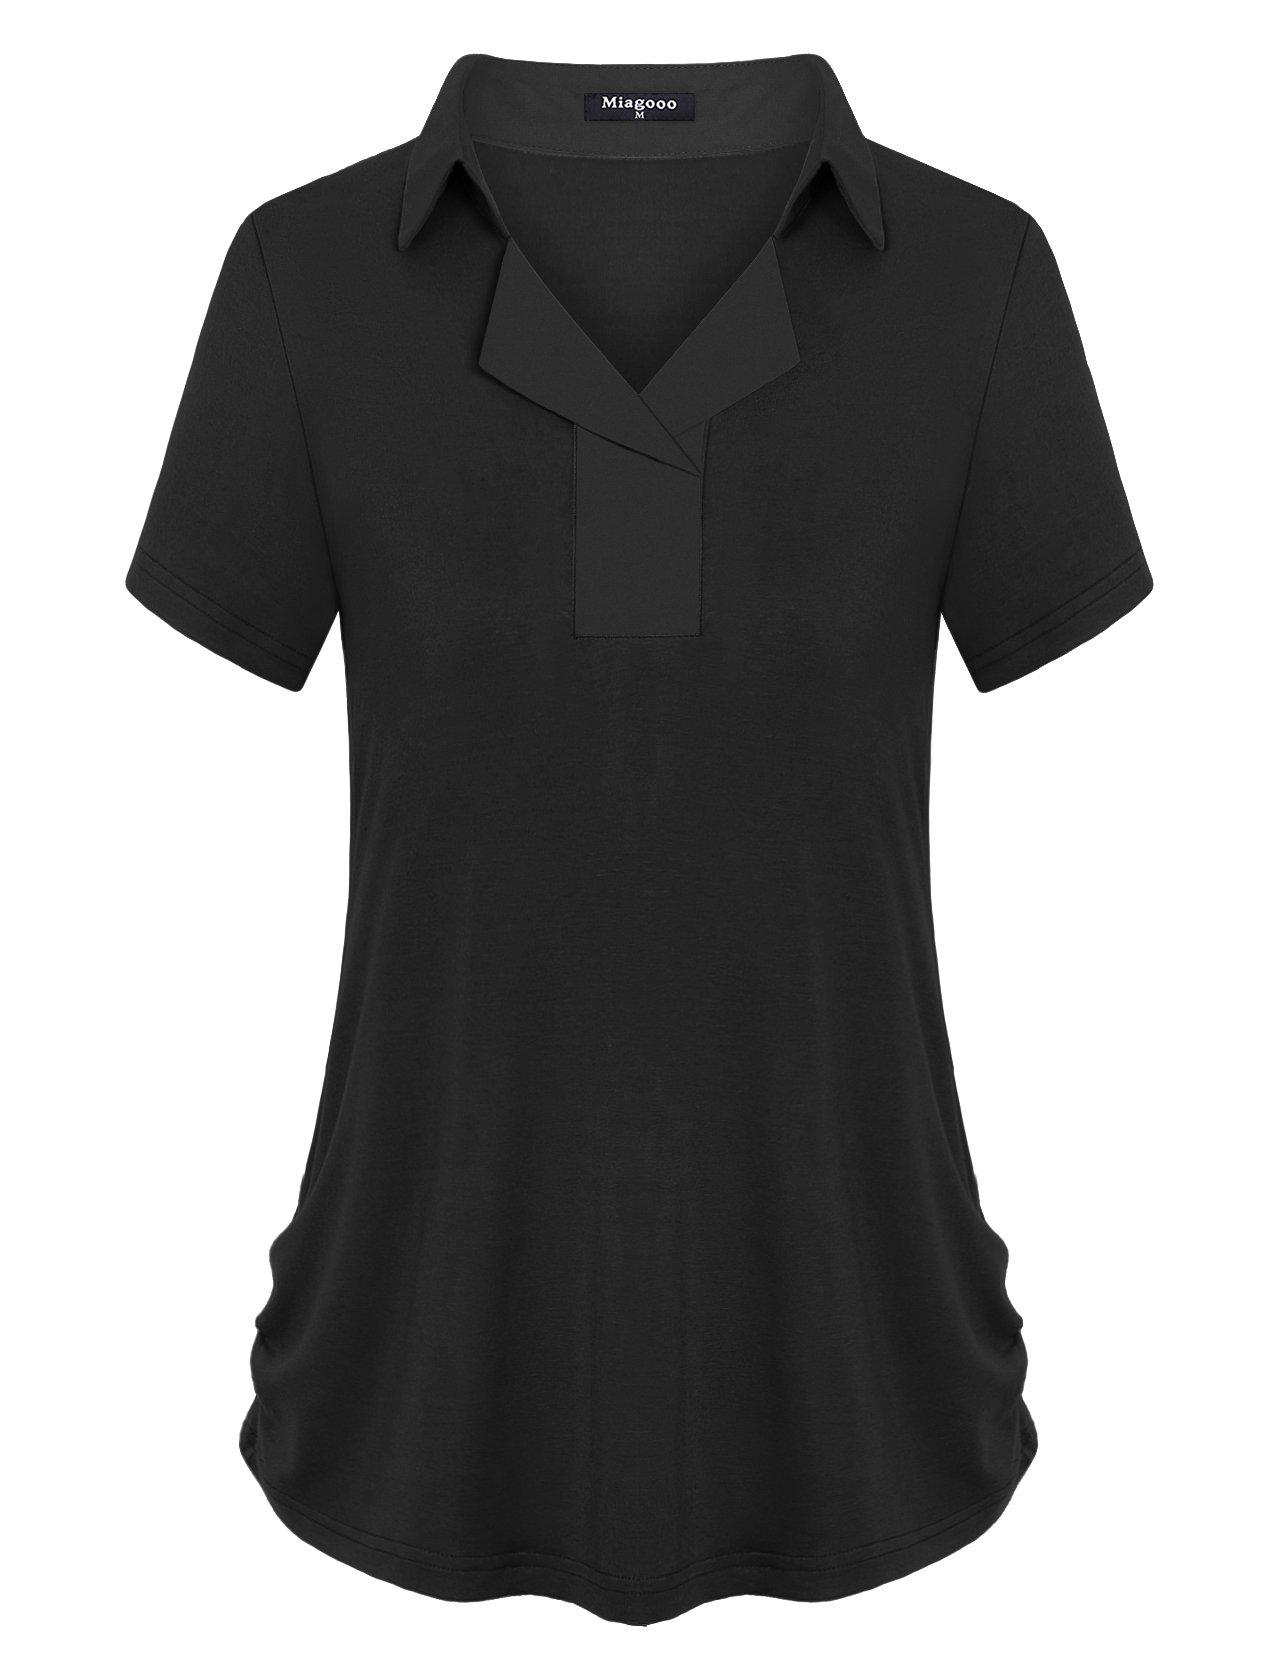 Miagooo Womens Tops and Blouses, Ladies Boutique Clothing Fashion Notch Collar Shirt Split V Neck Short Sleeve Button Down Pullover Tunic Basic Comfort Lightweight Polo Tshirt Black Medium